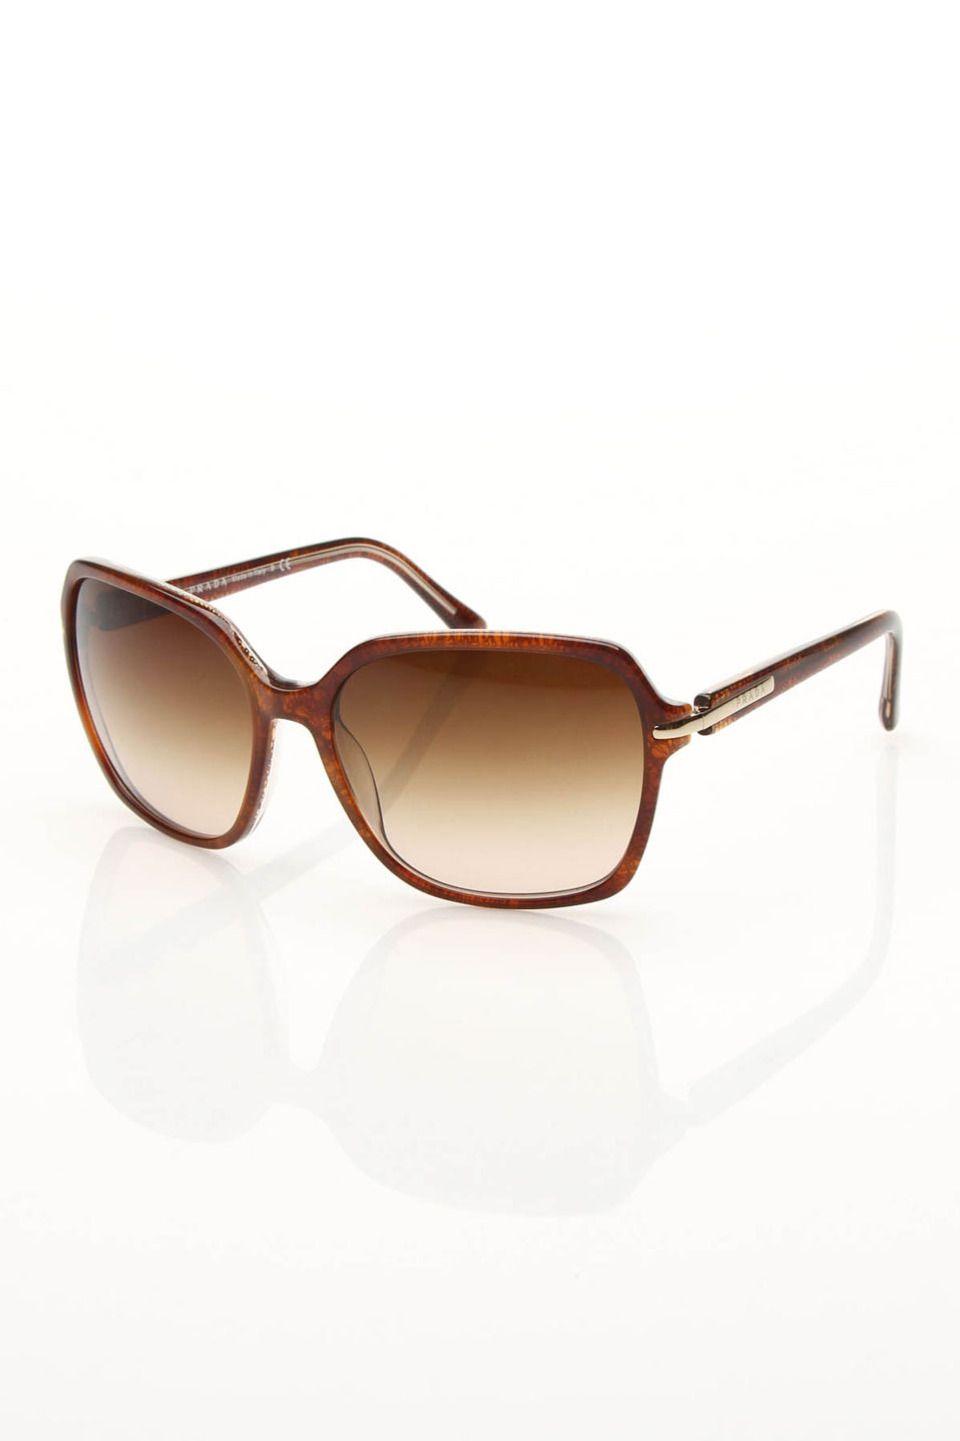 a2be6b3a3c2 ... coupon for prada sandra sunglasses brown eyed girls aviators prada what  to wear c71a8 31929 ...